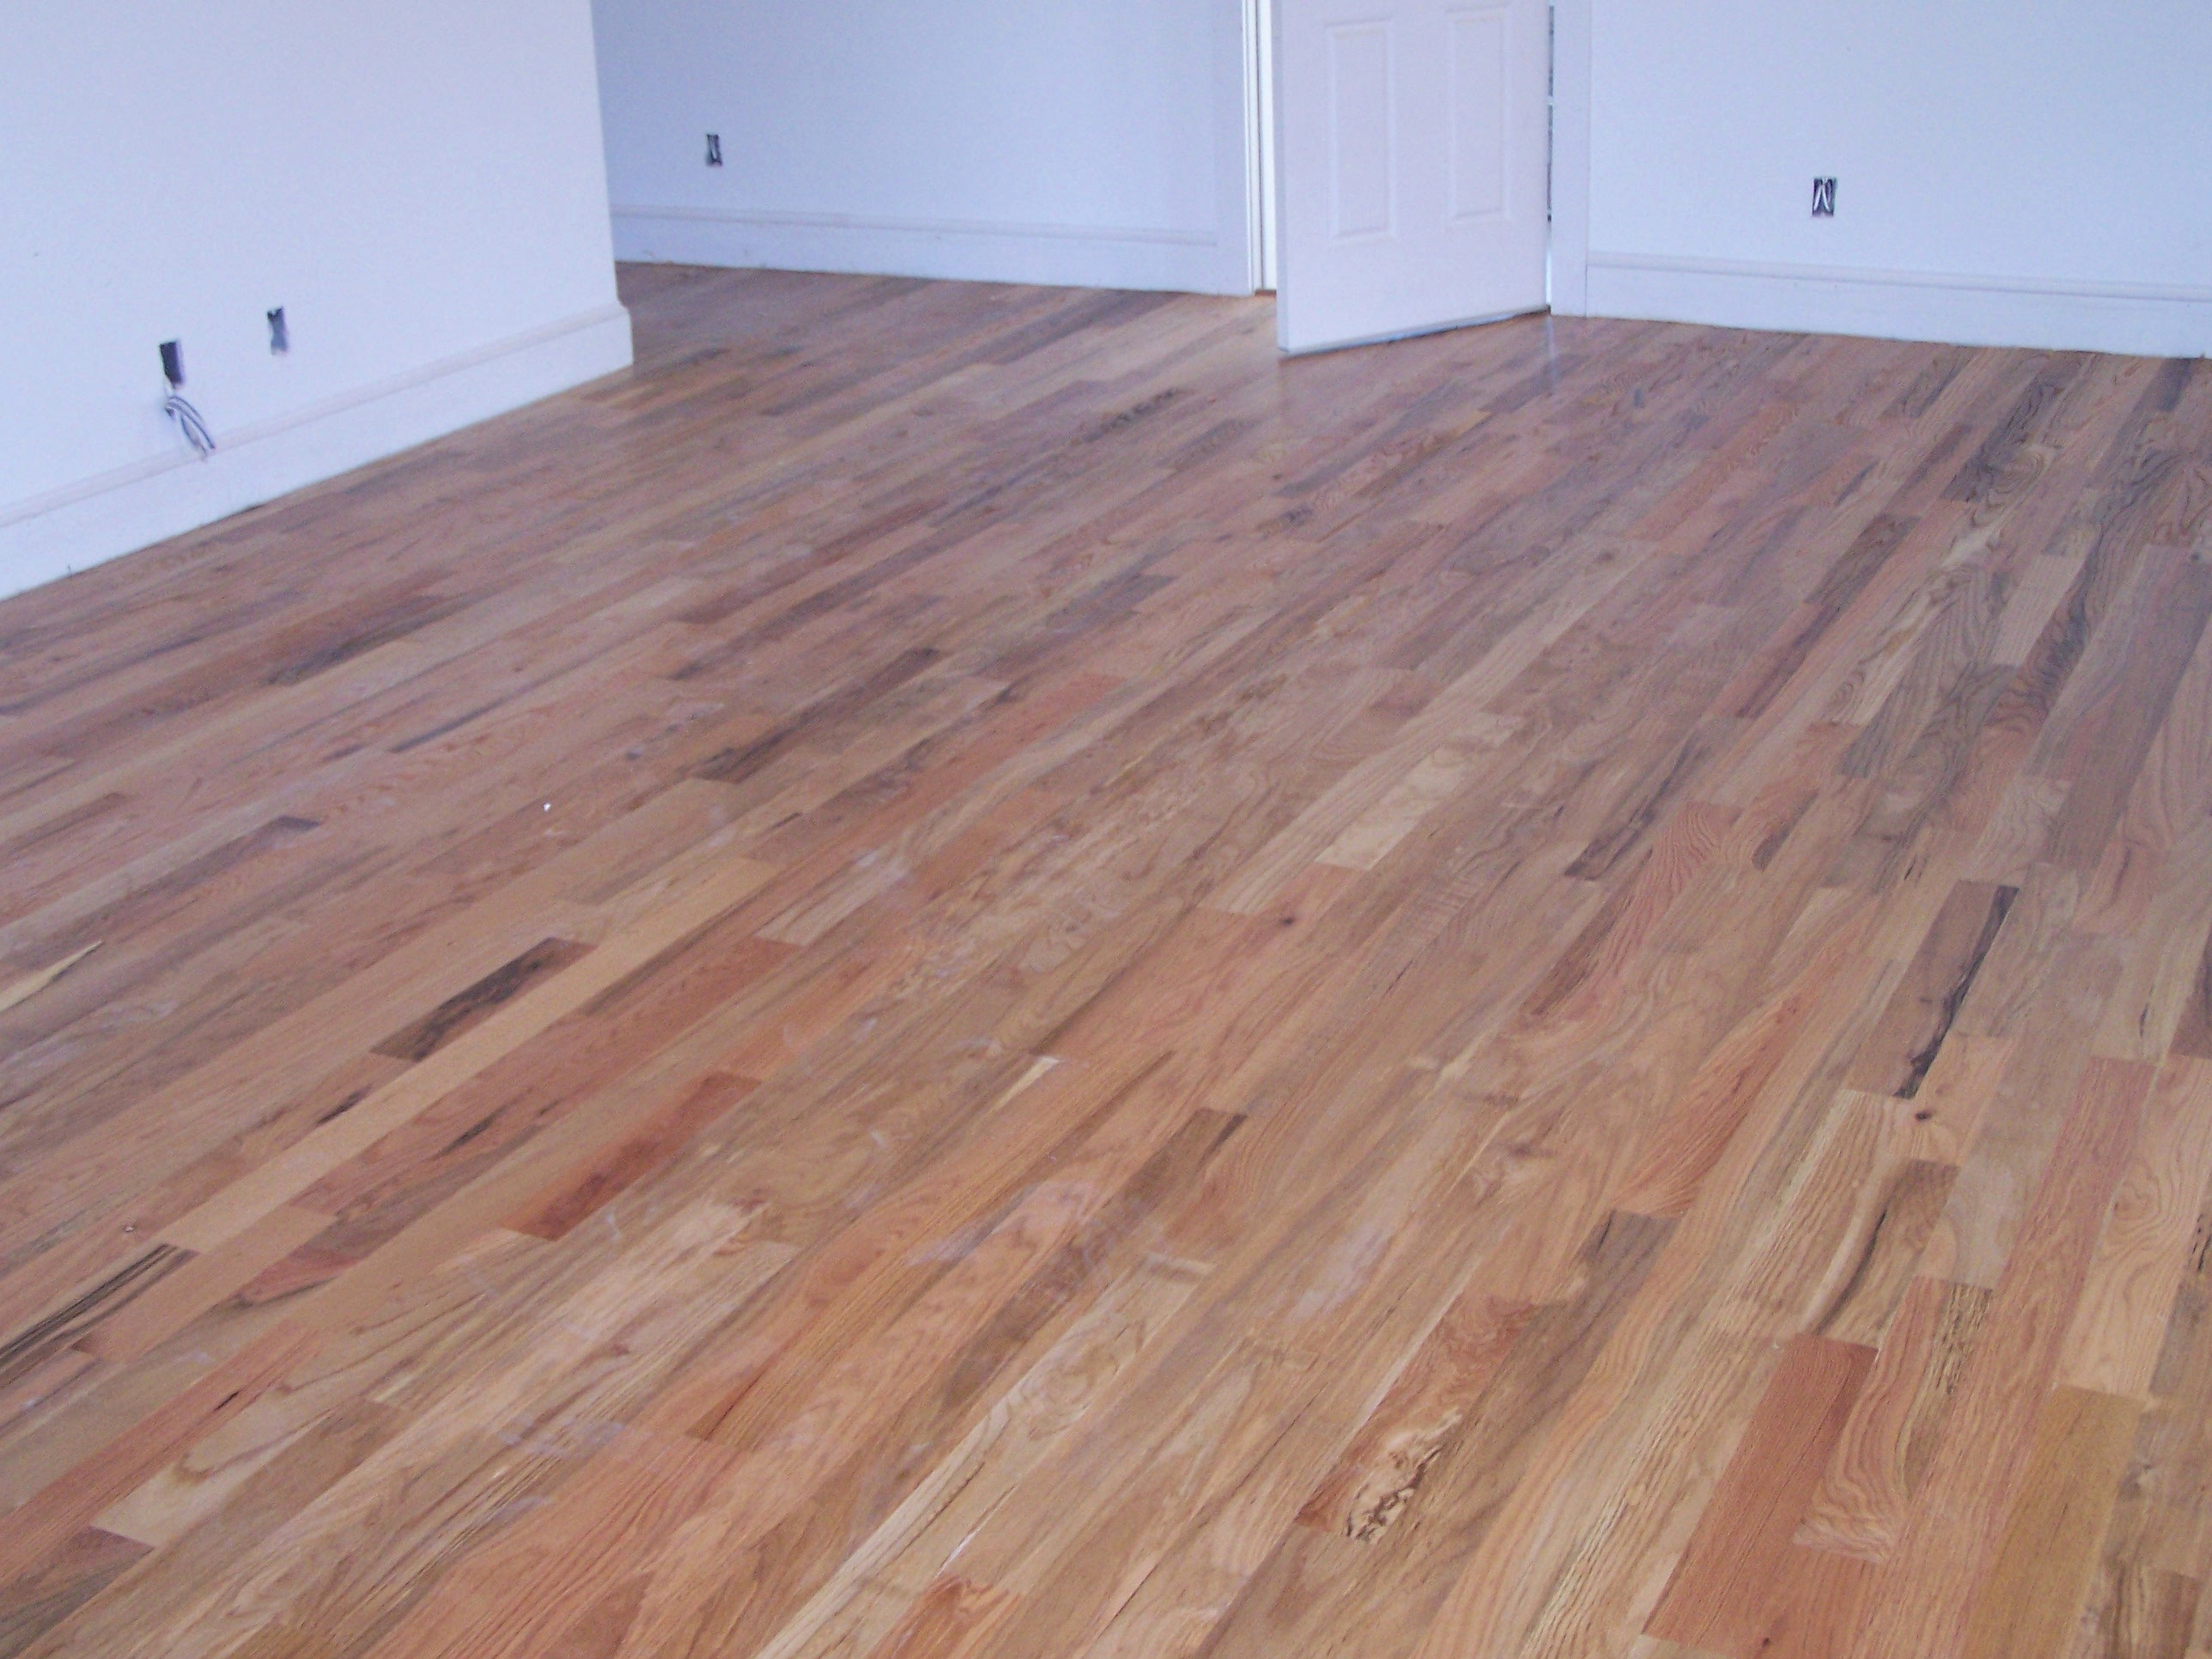 red oak hardwood flooring unfinished of red oak hardwood flooring 50 beautiful cost to refinish hardwood for red oak hardwood flooring 50 fresh ceramic tile vs hardwood flooring cost graphics 50 s